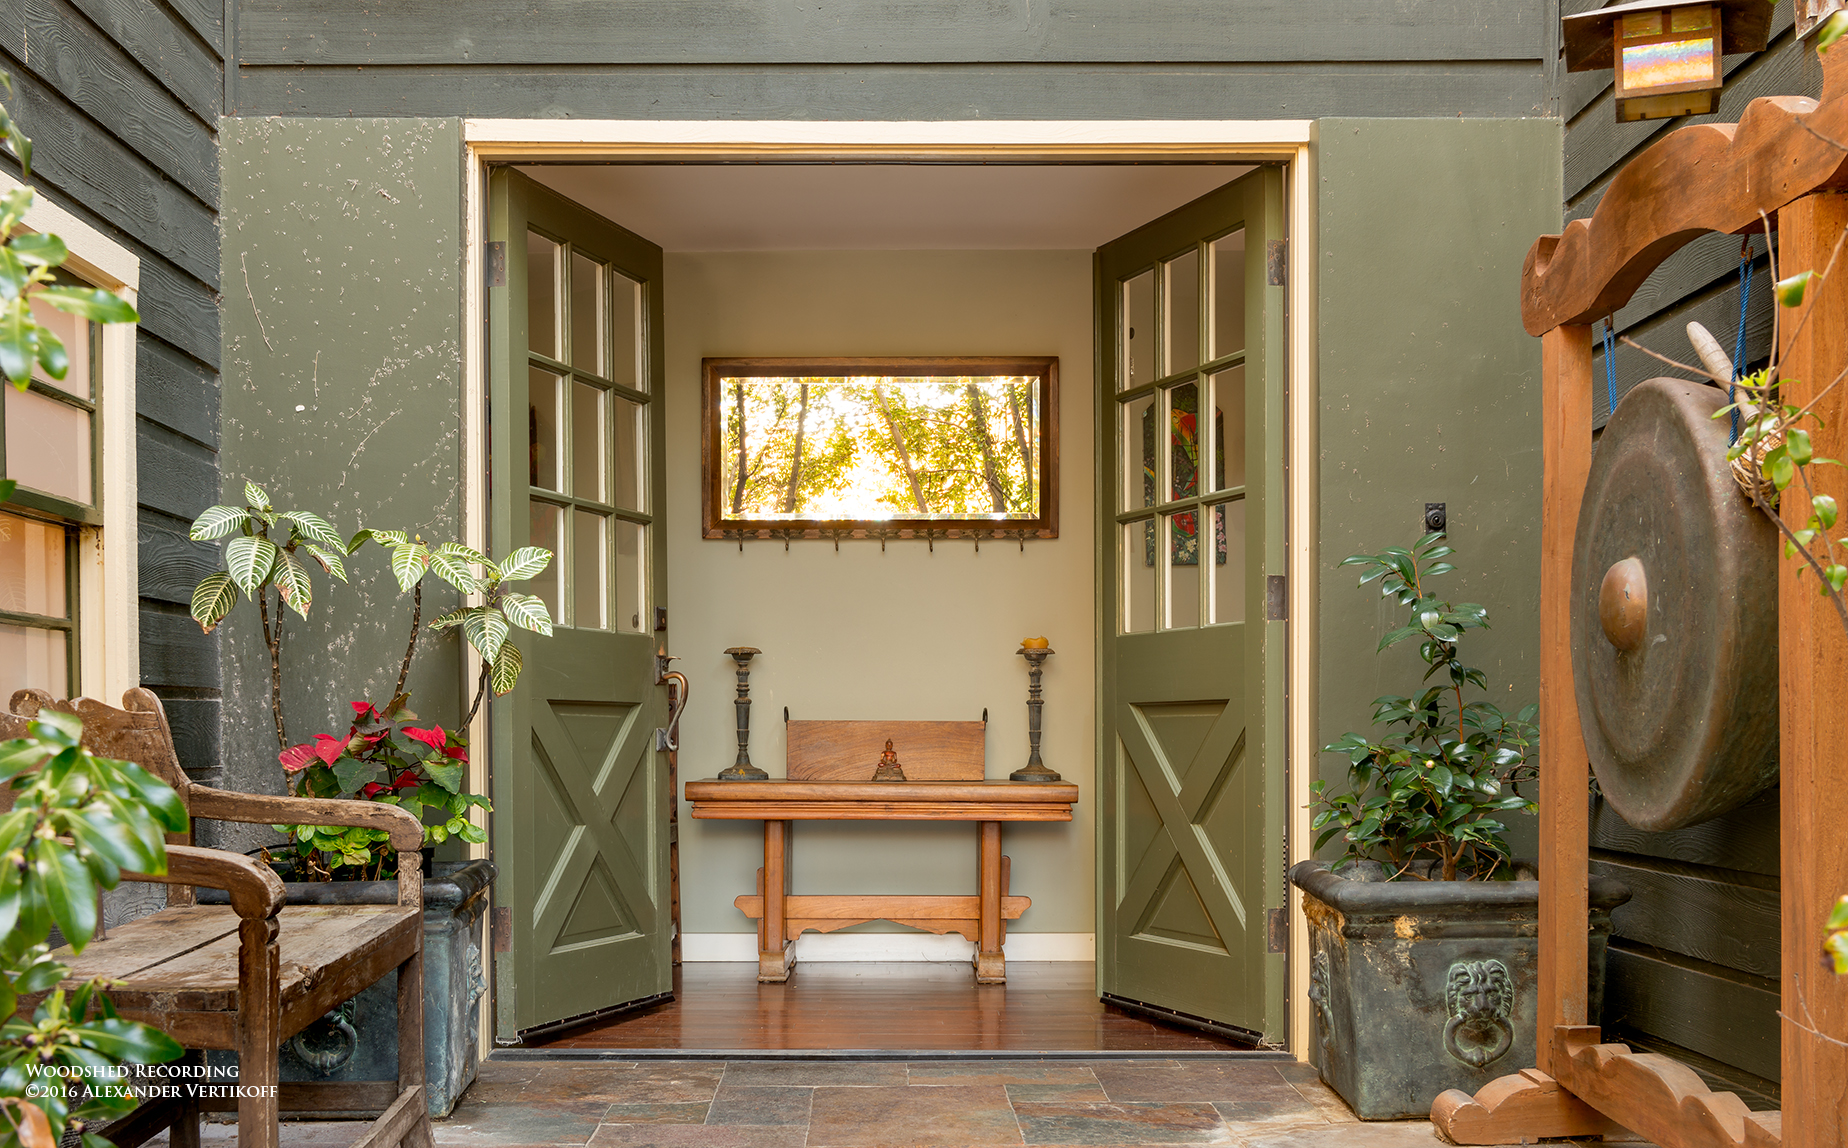 studio-malibu-woodshed-recording-studio-best-recording-studio-malibu-home-entrance.jpg